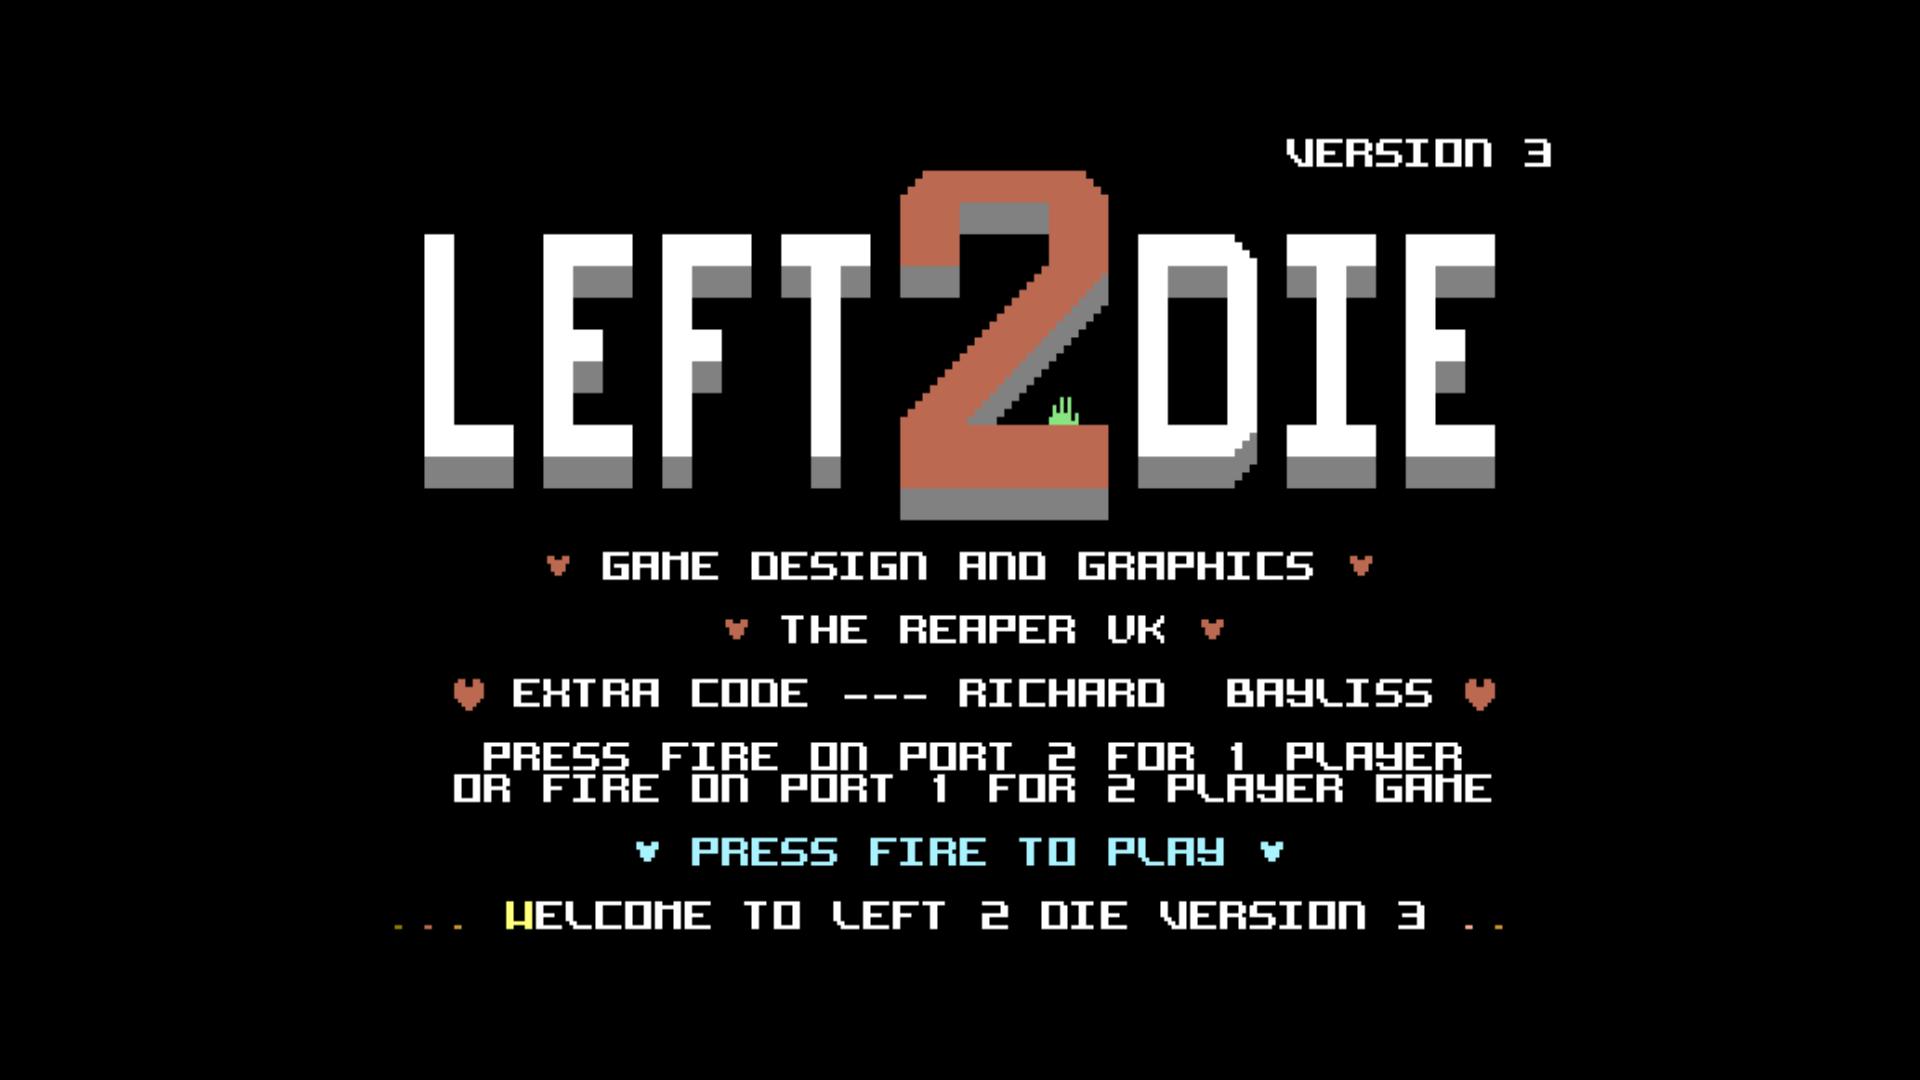 Left 2 Die (C64)